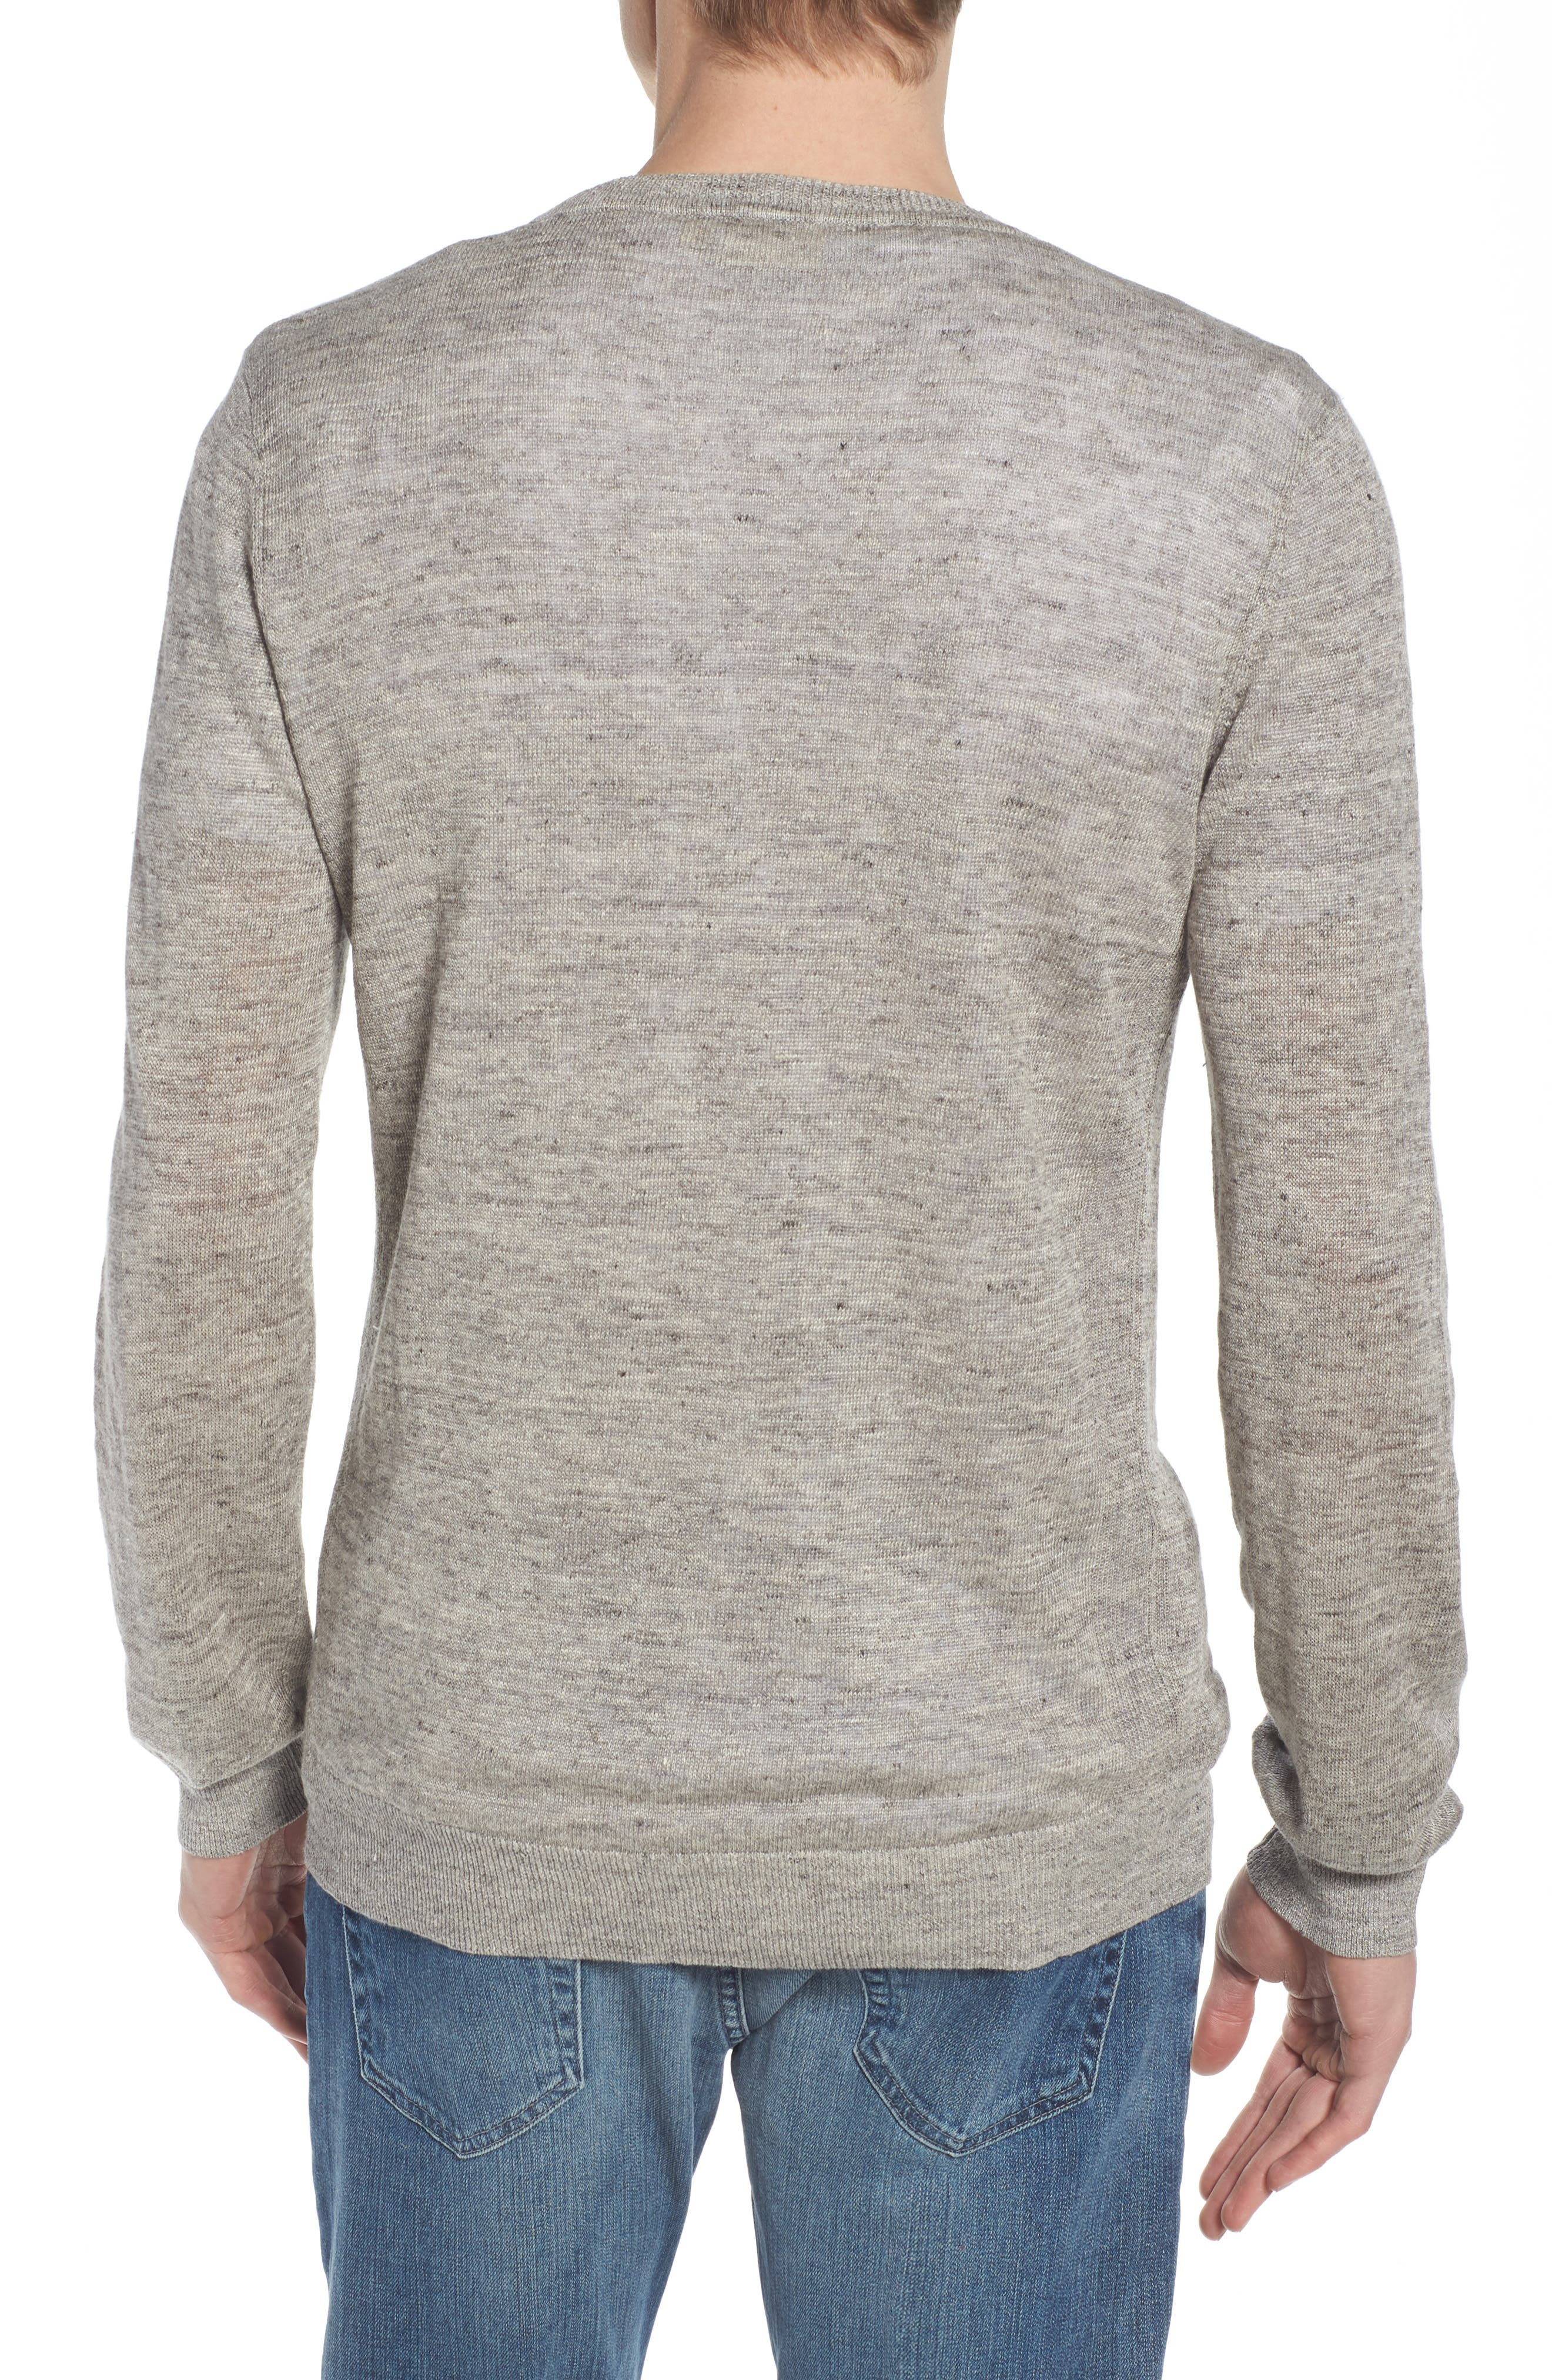 Heyward Long Sleeve T-Shirt,                             Alternate thumbnail 2, color,                             Heather Grey